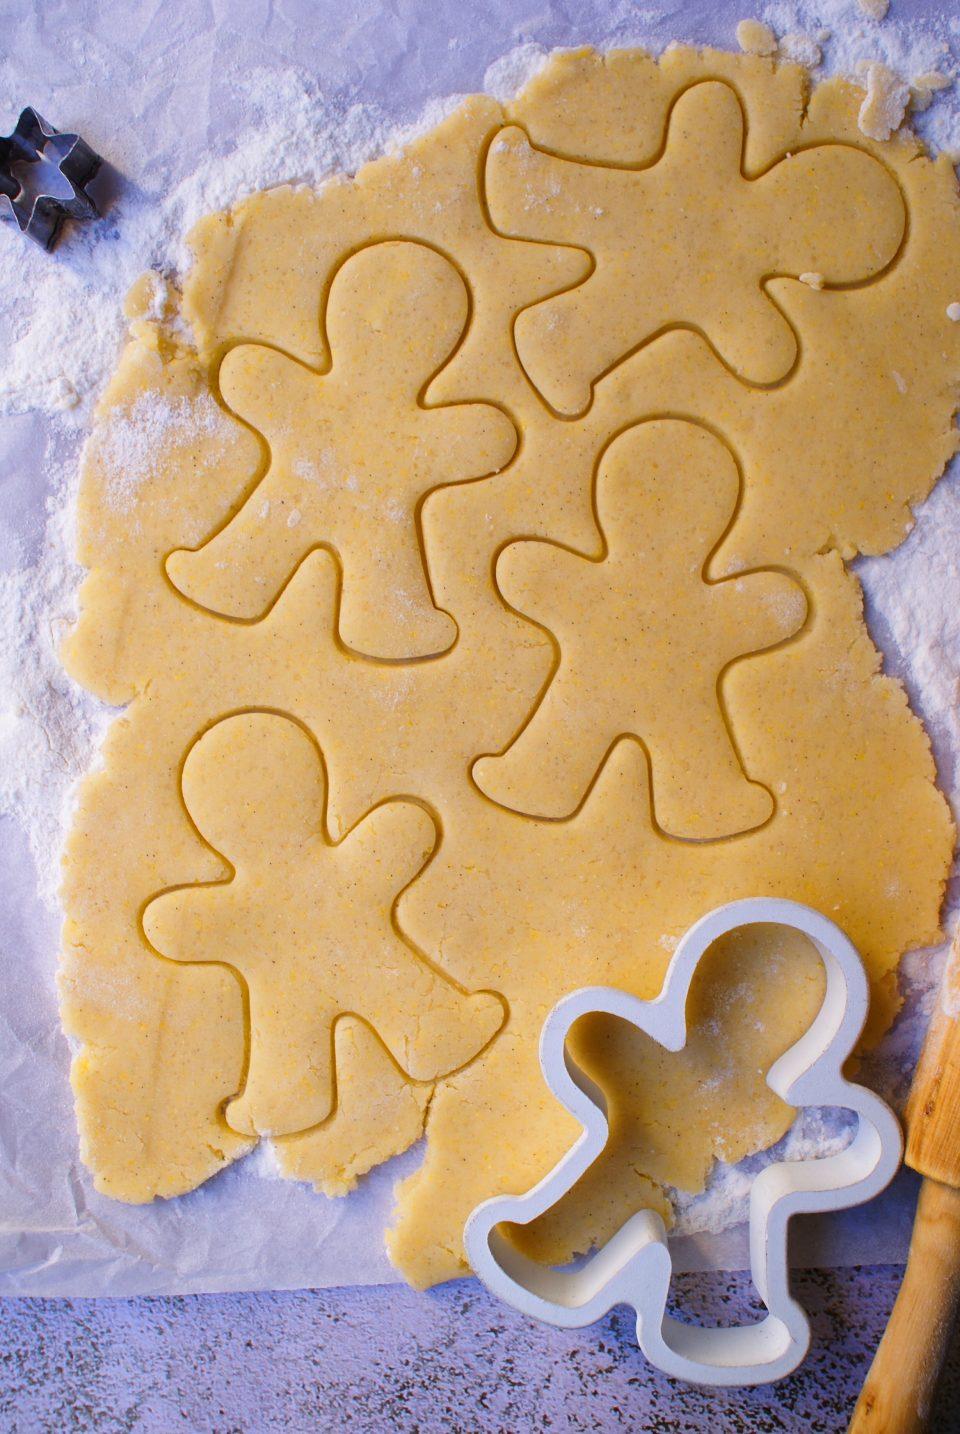 Gluten free cinnamon cookies